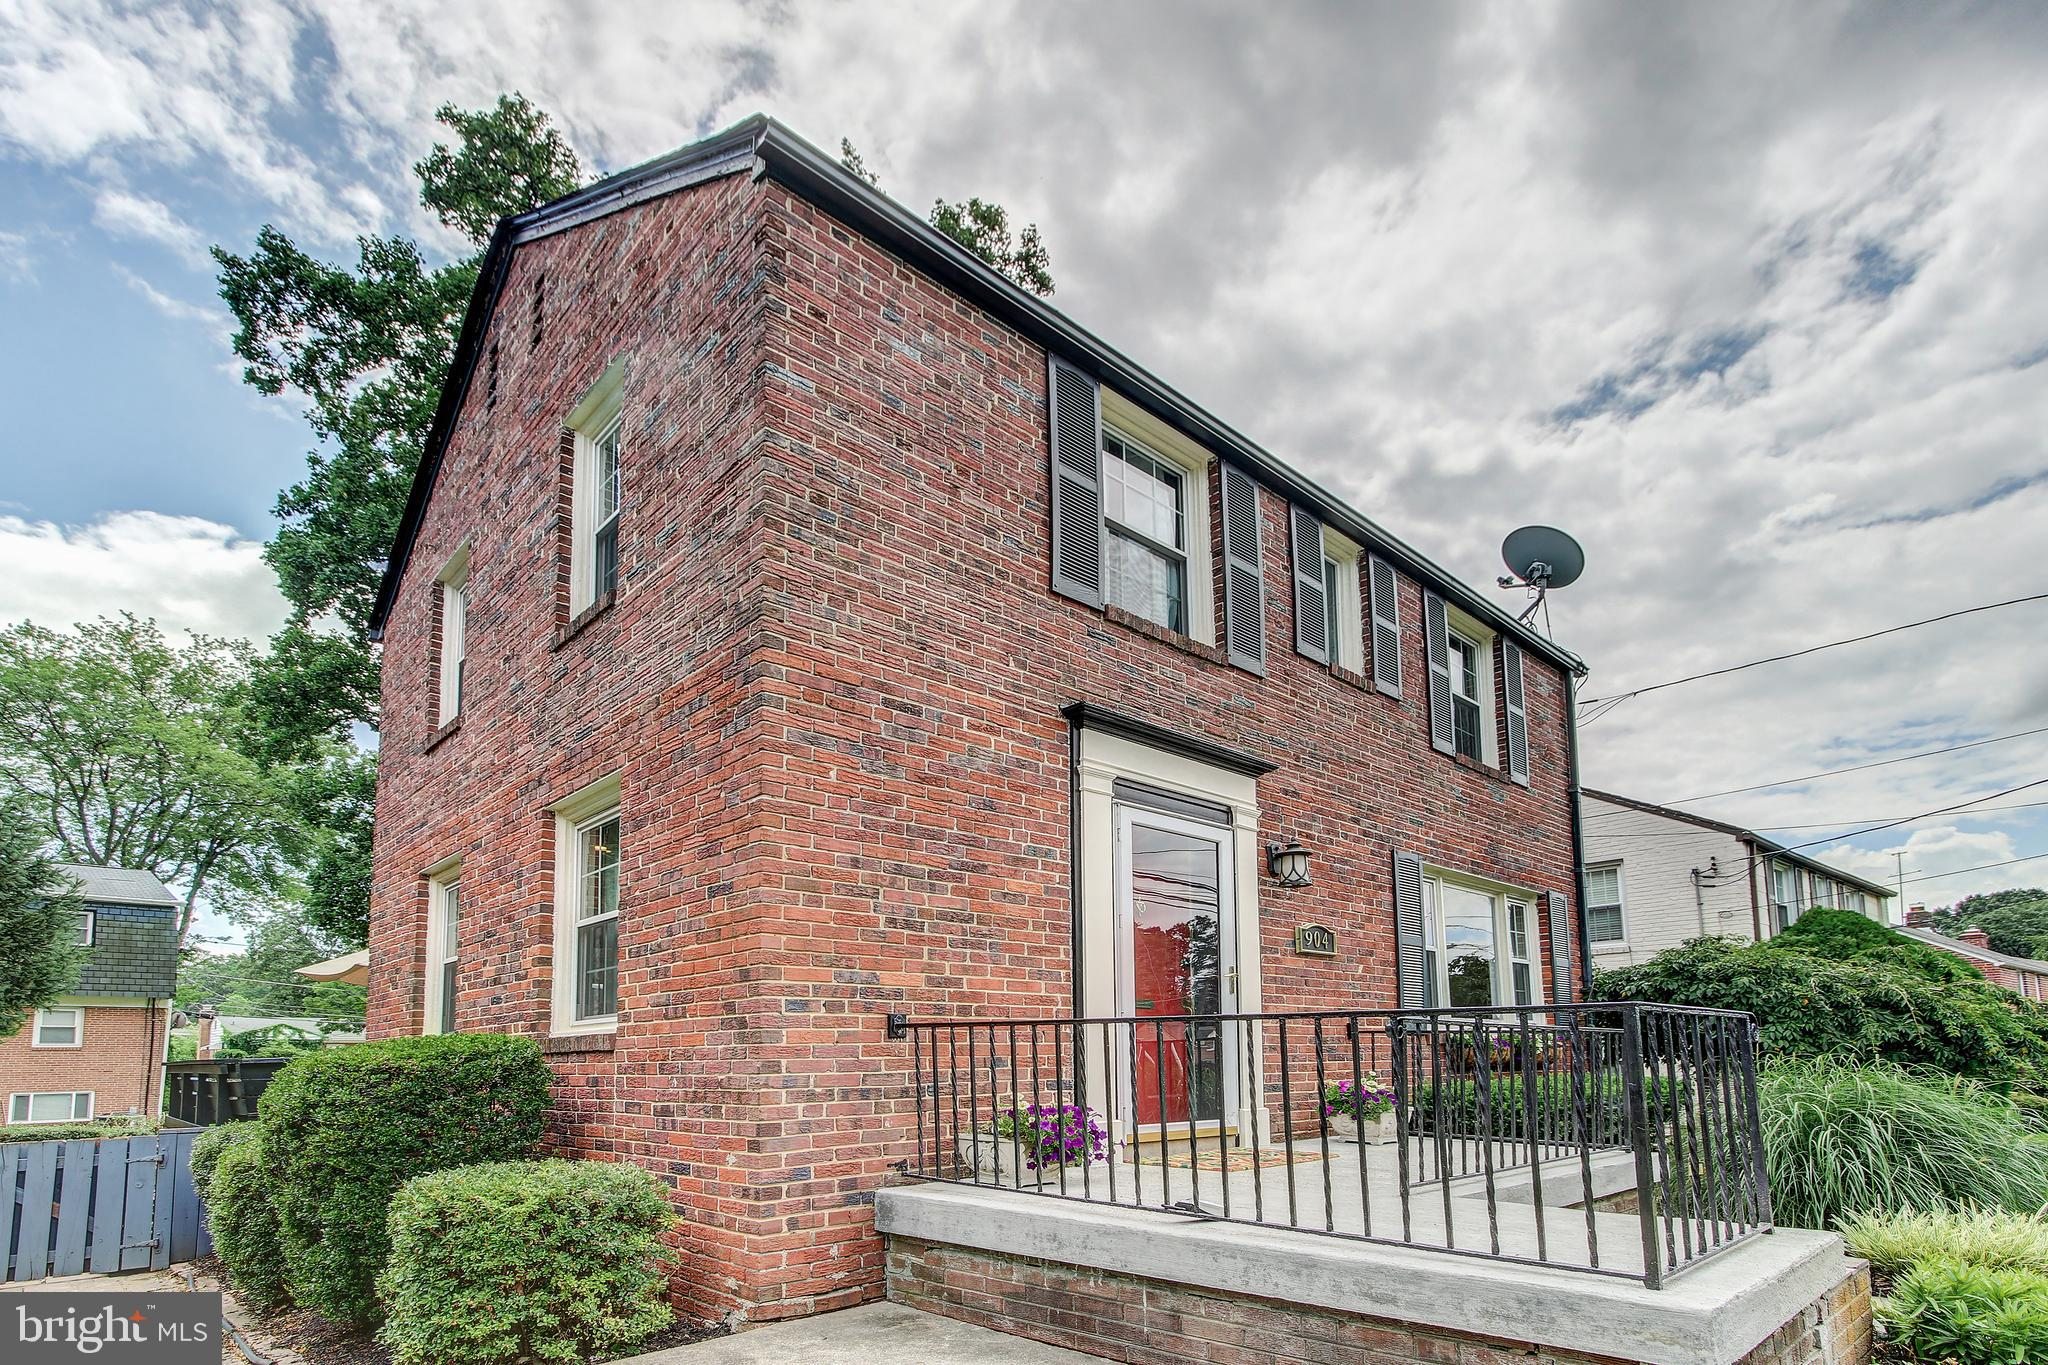 904 Dennis Ave, Silver Spring, MD, 20901